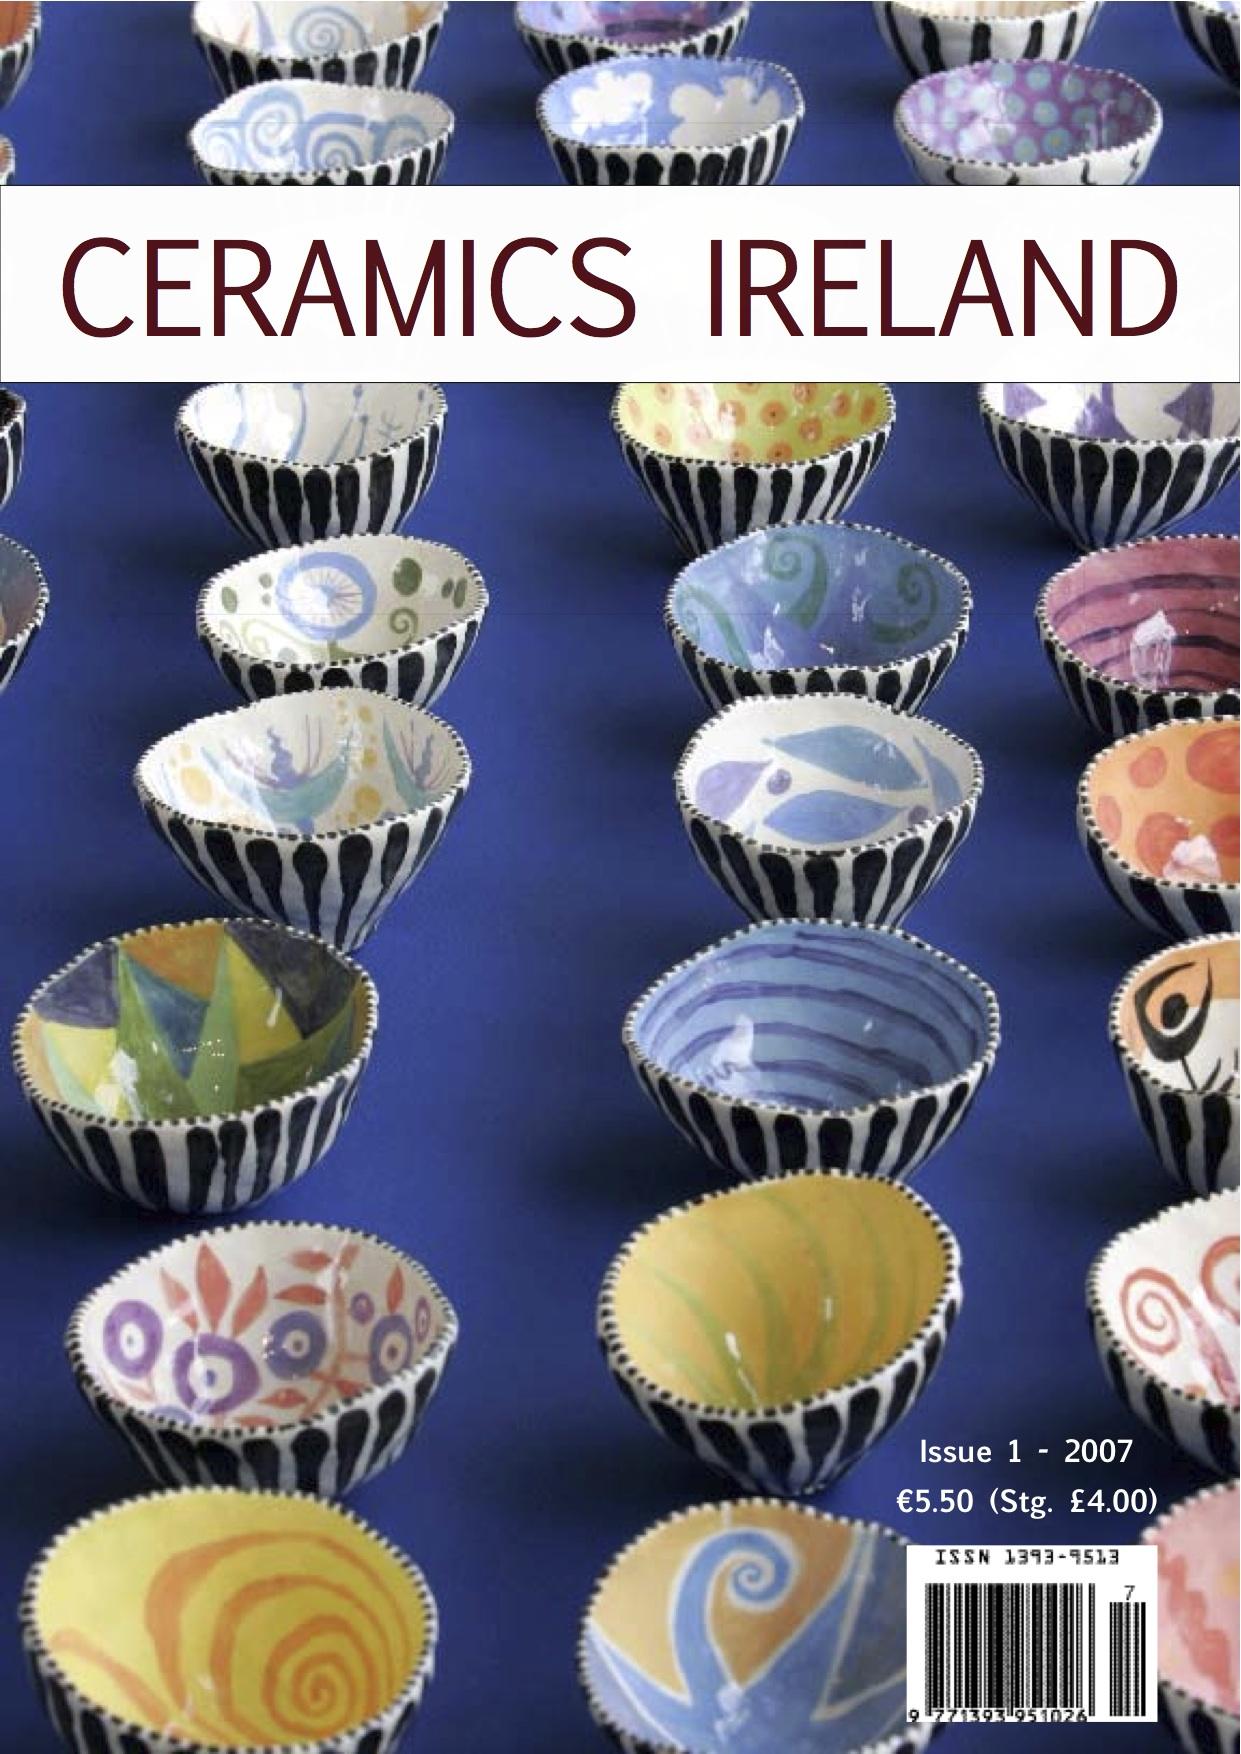 Issue 2007 - Cover John ffrench.jpg